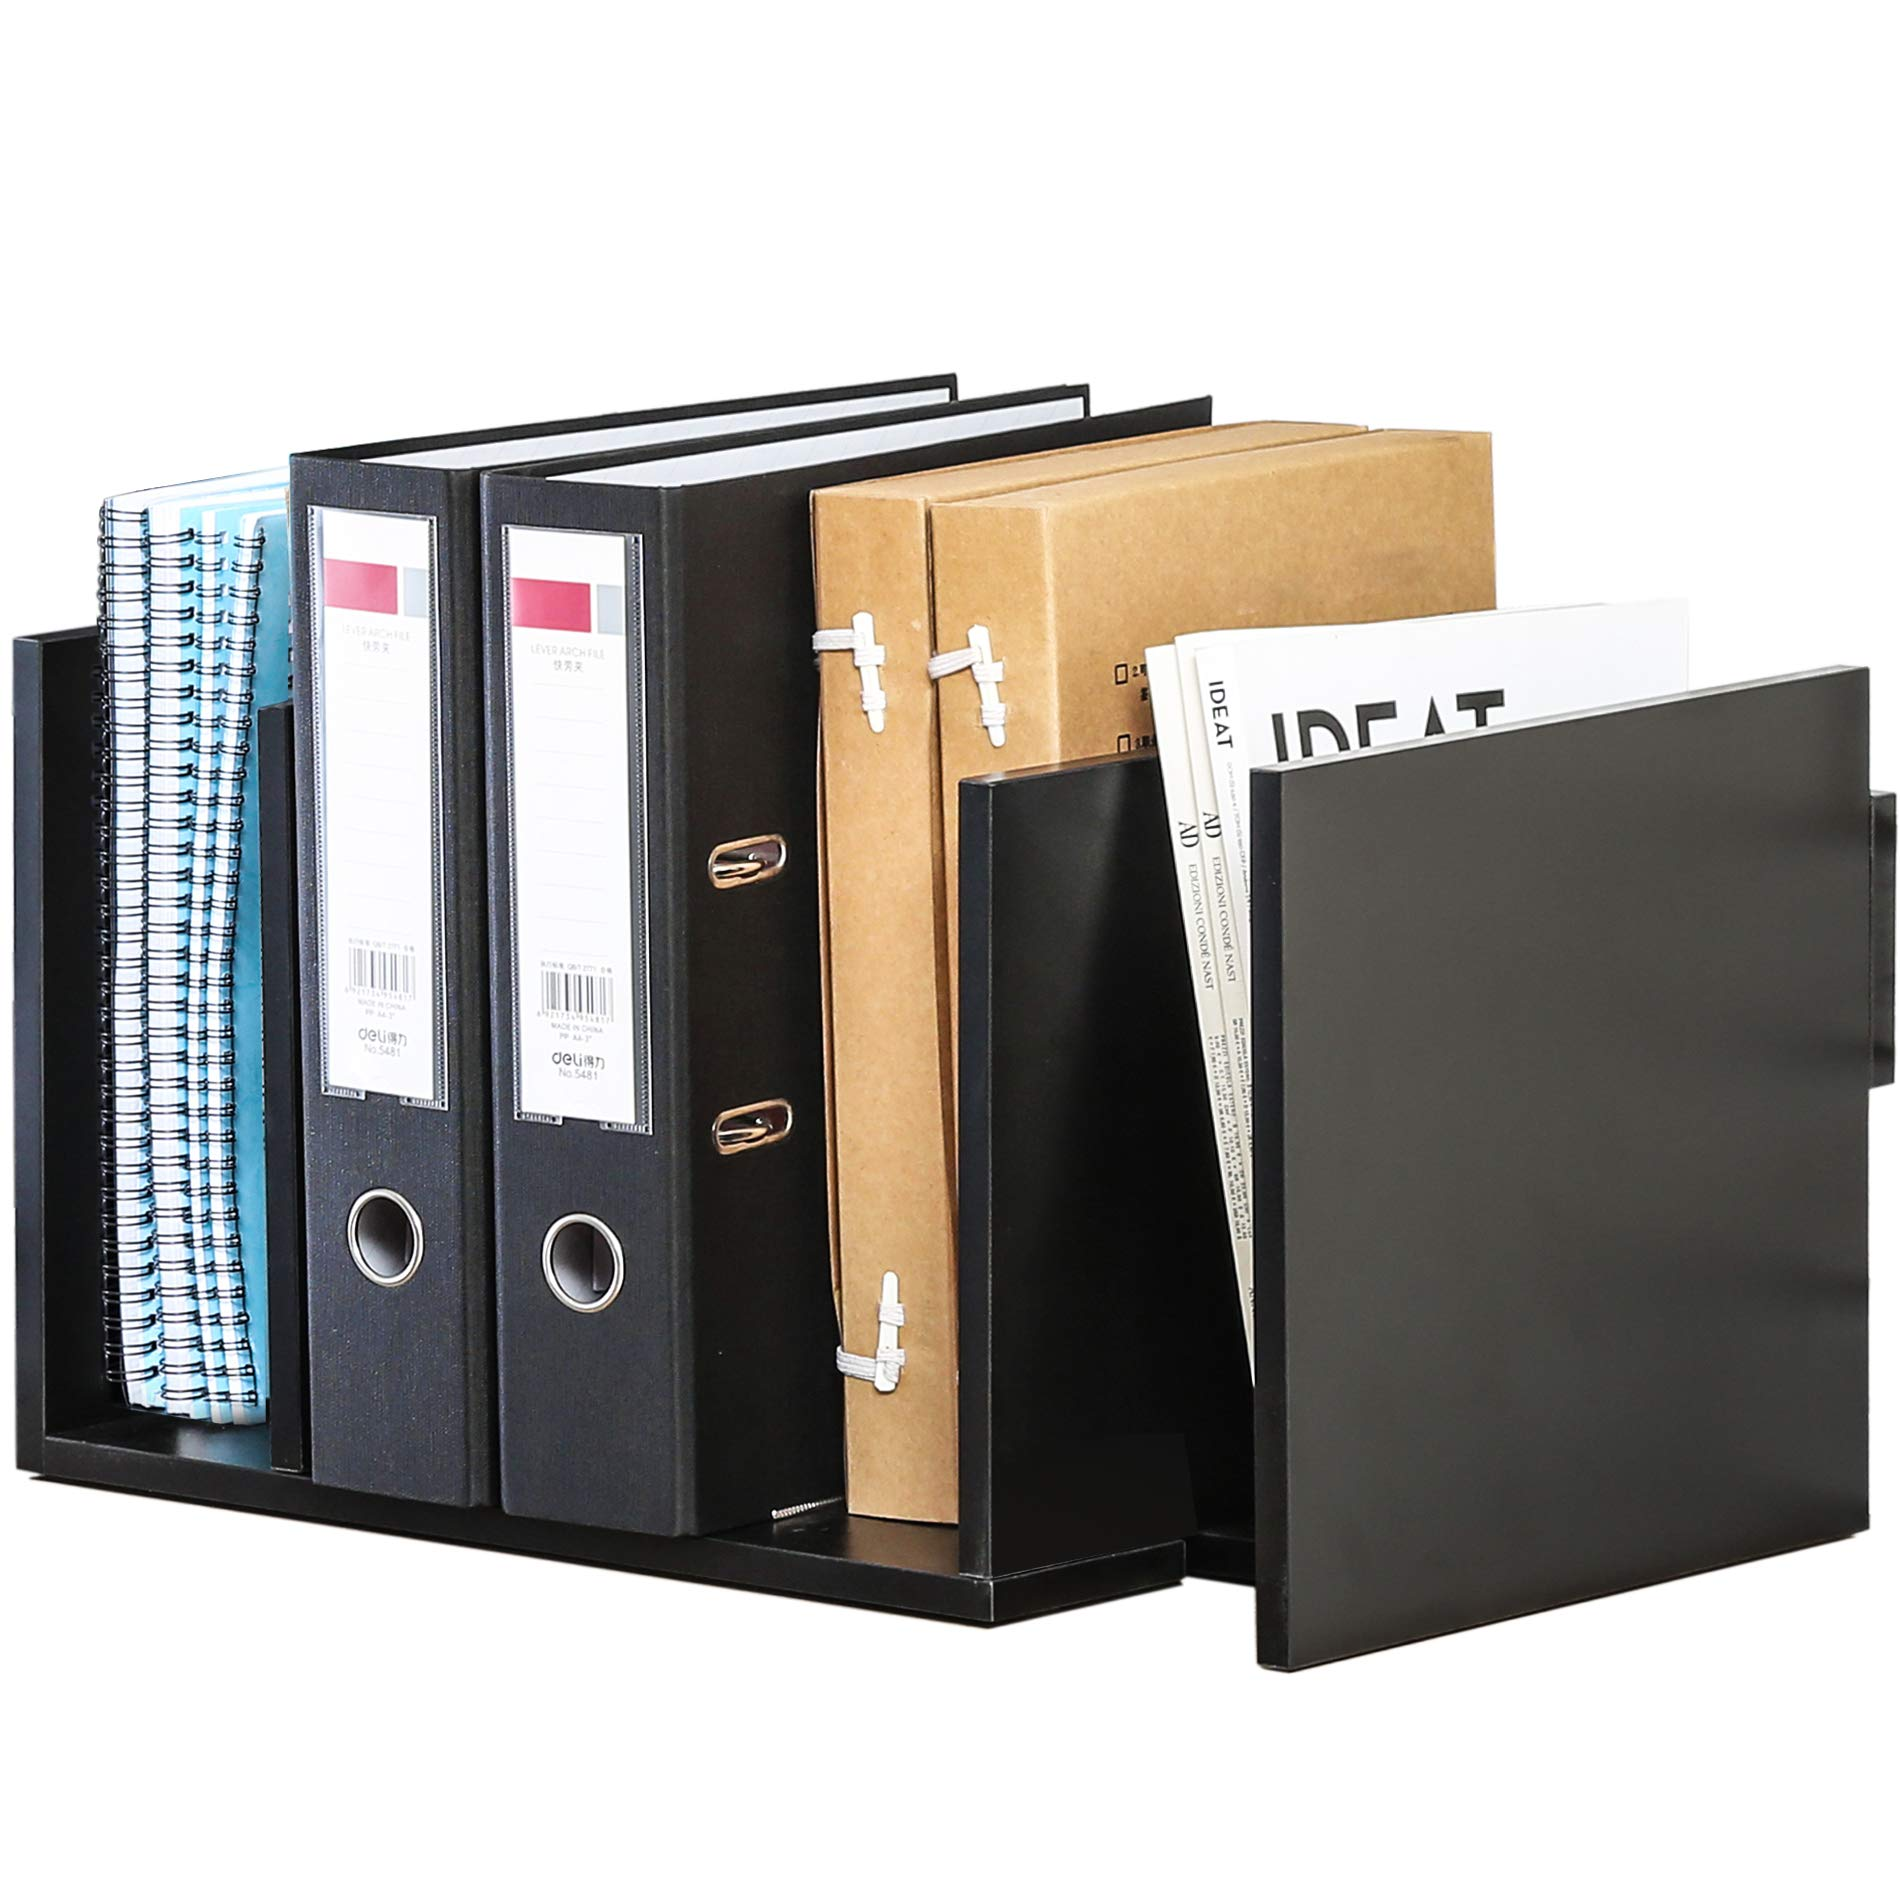 FITUEYES Extension Book Rack Desk Bookshelf Organiser for Office Home Expandable Tidy Desktop Storage Organizer Display Shelf Rack Counter Top Bookcase DT107701WB